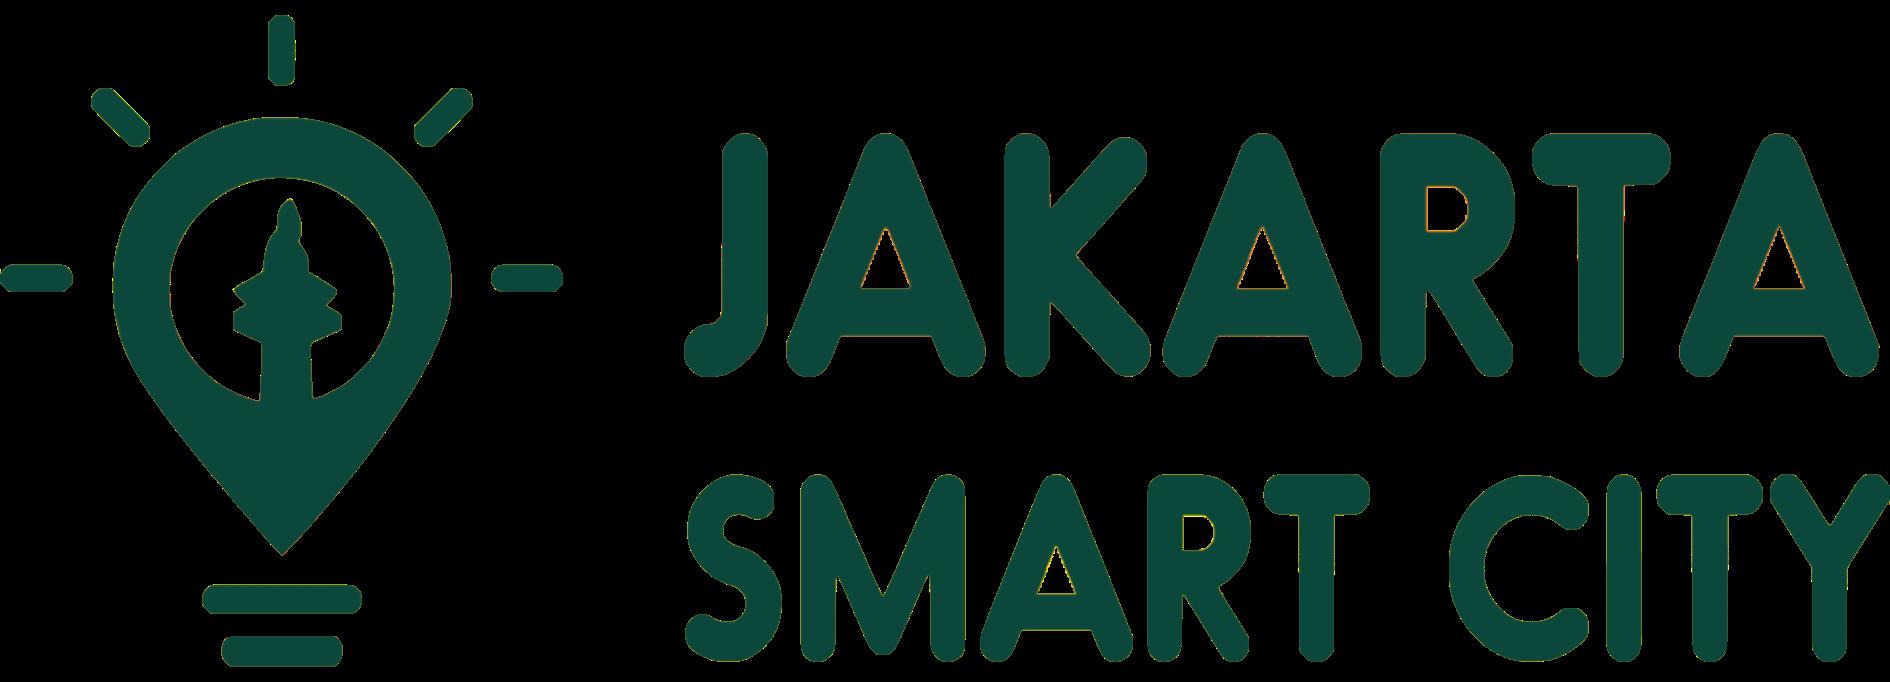 Misi Kami Peduli logo